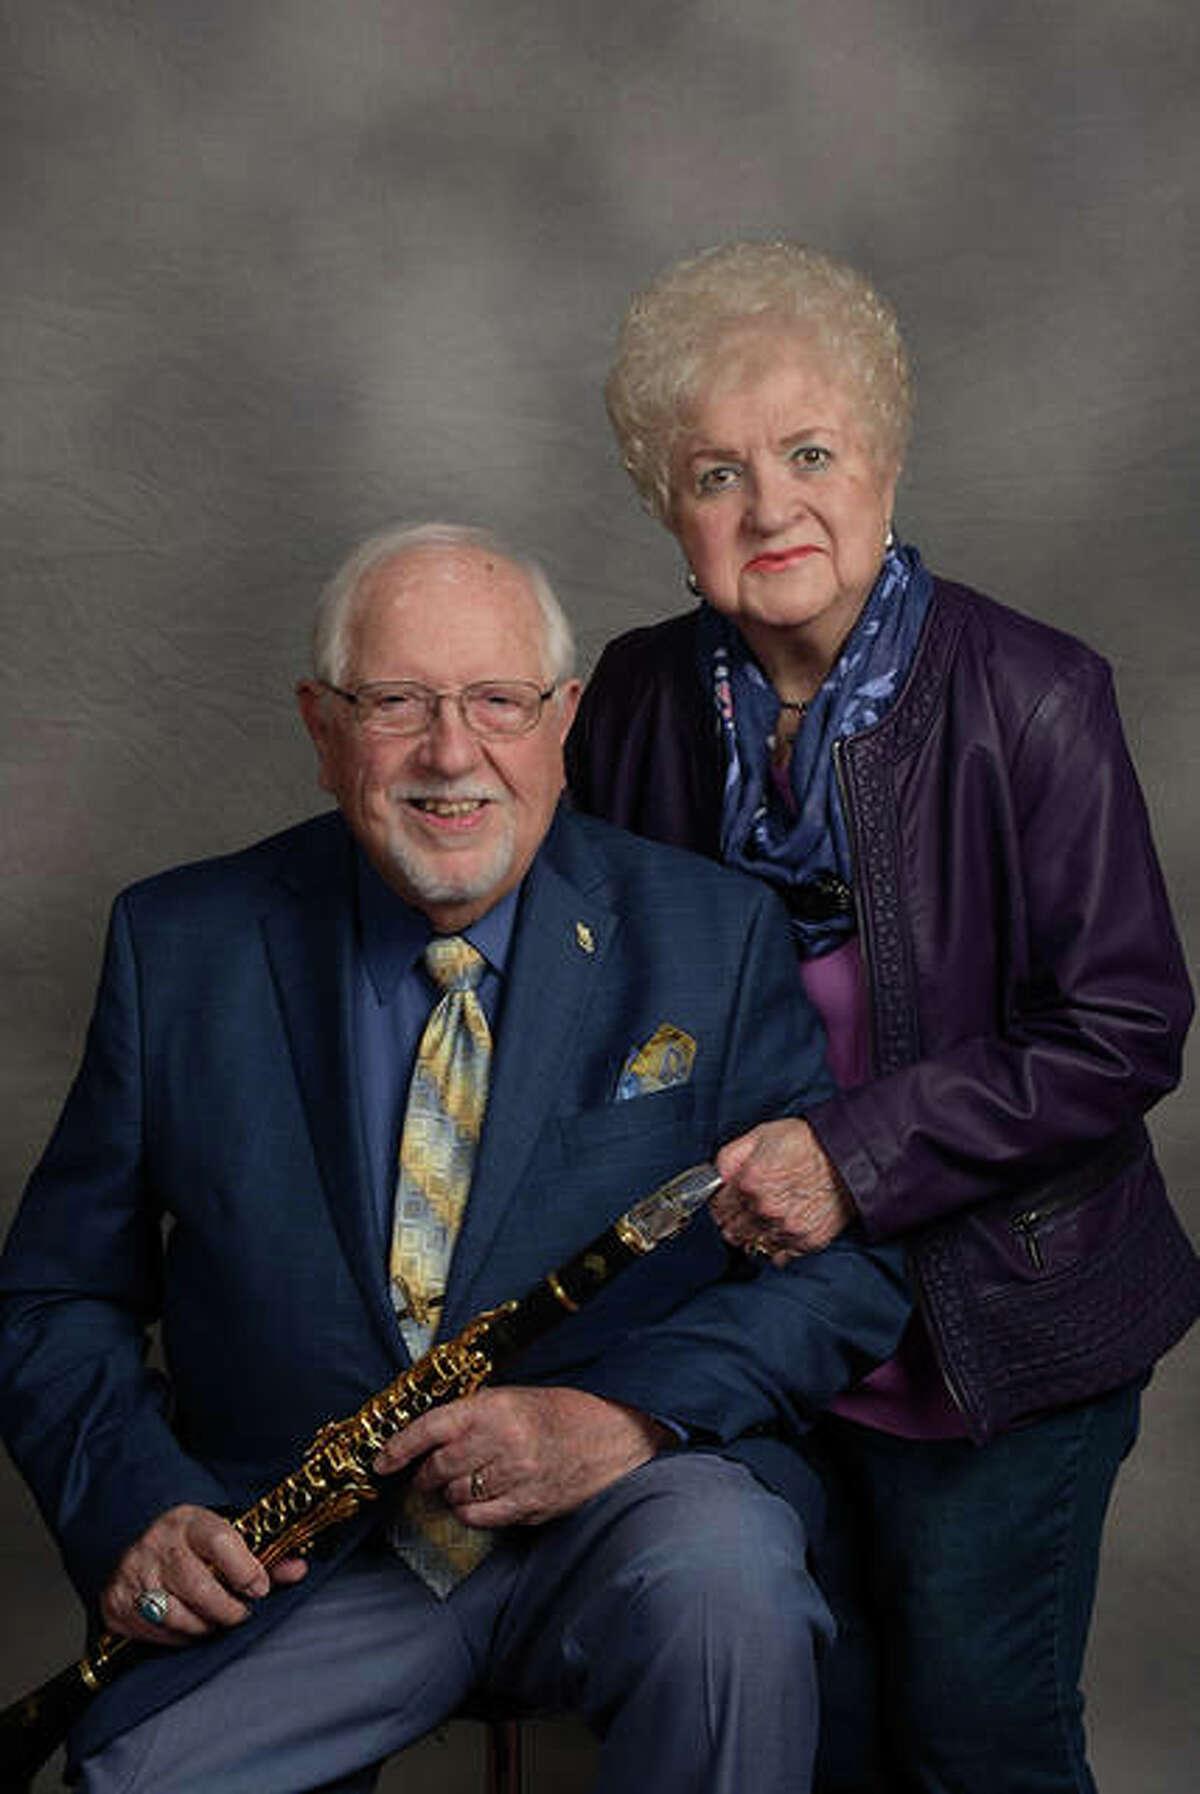 Bud and Gail Shultz